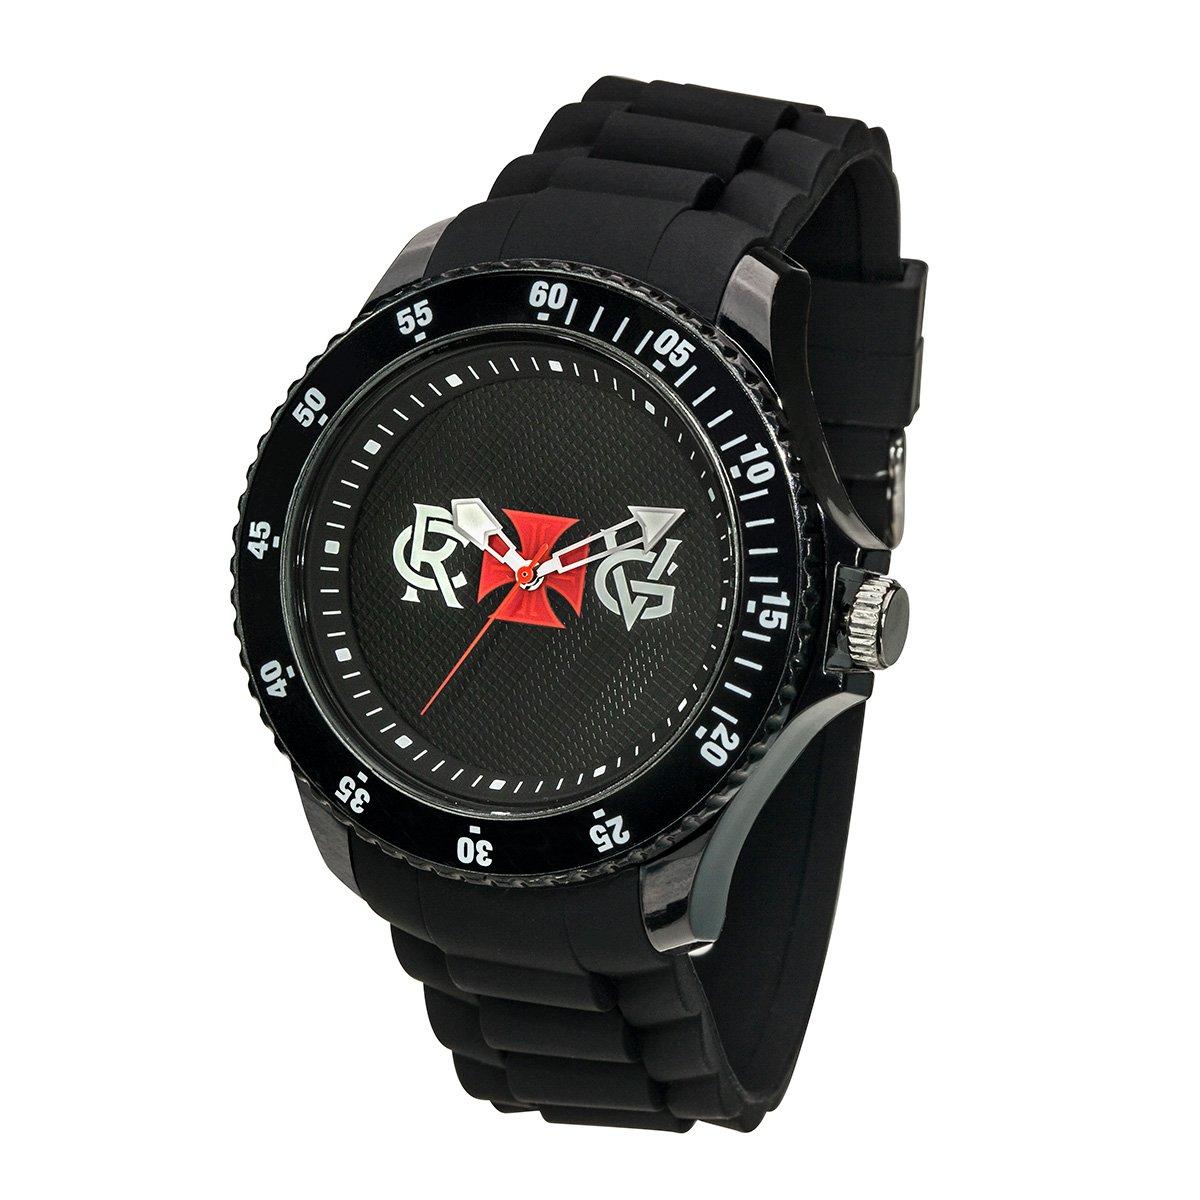 Relógio Vasco CRVG - Preto